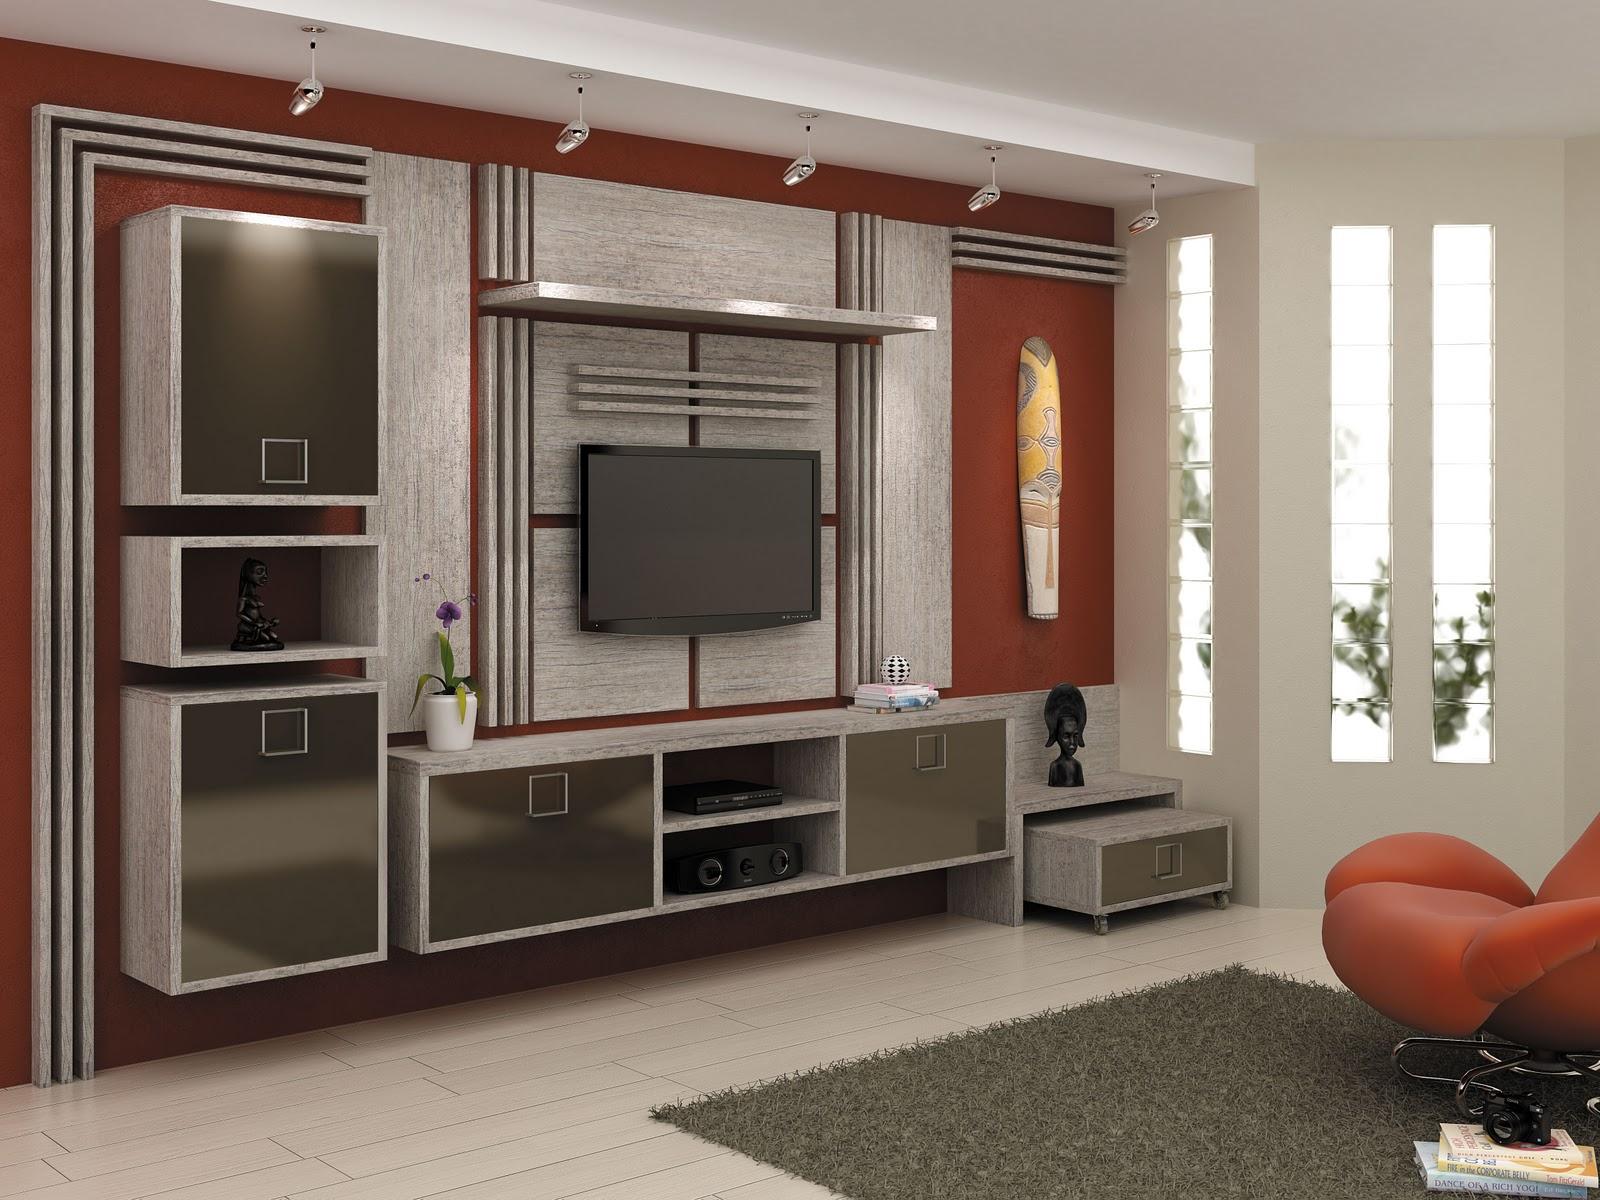 Lar mobile m veis planejados salas for Cerco mobile sala